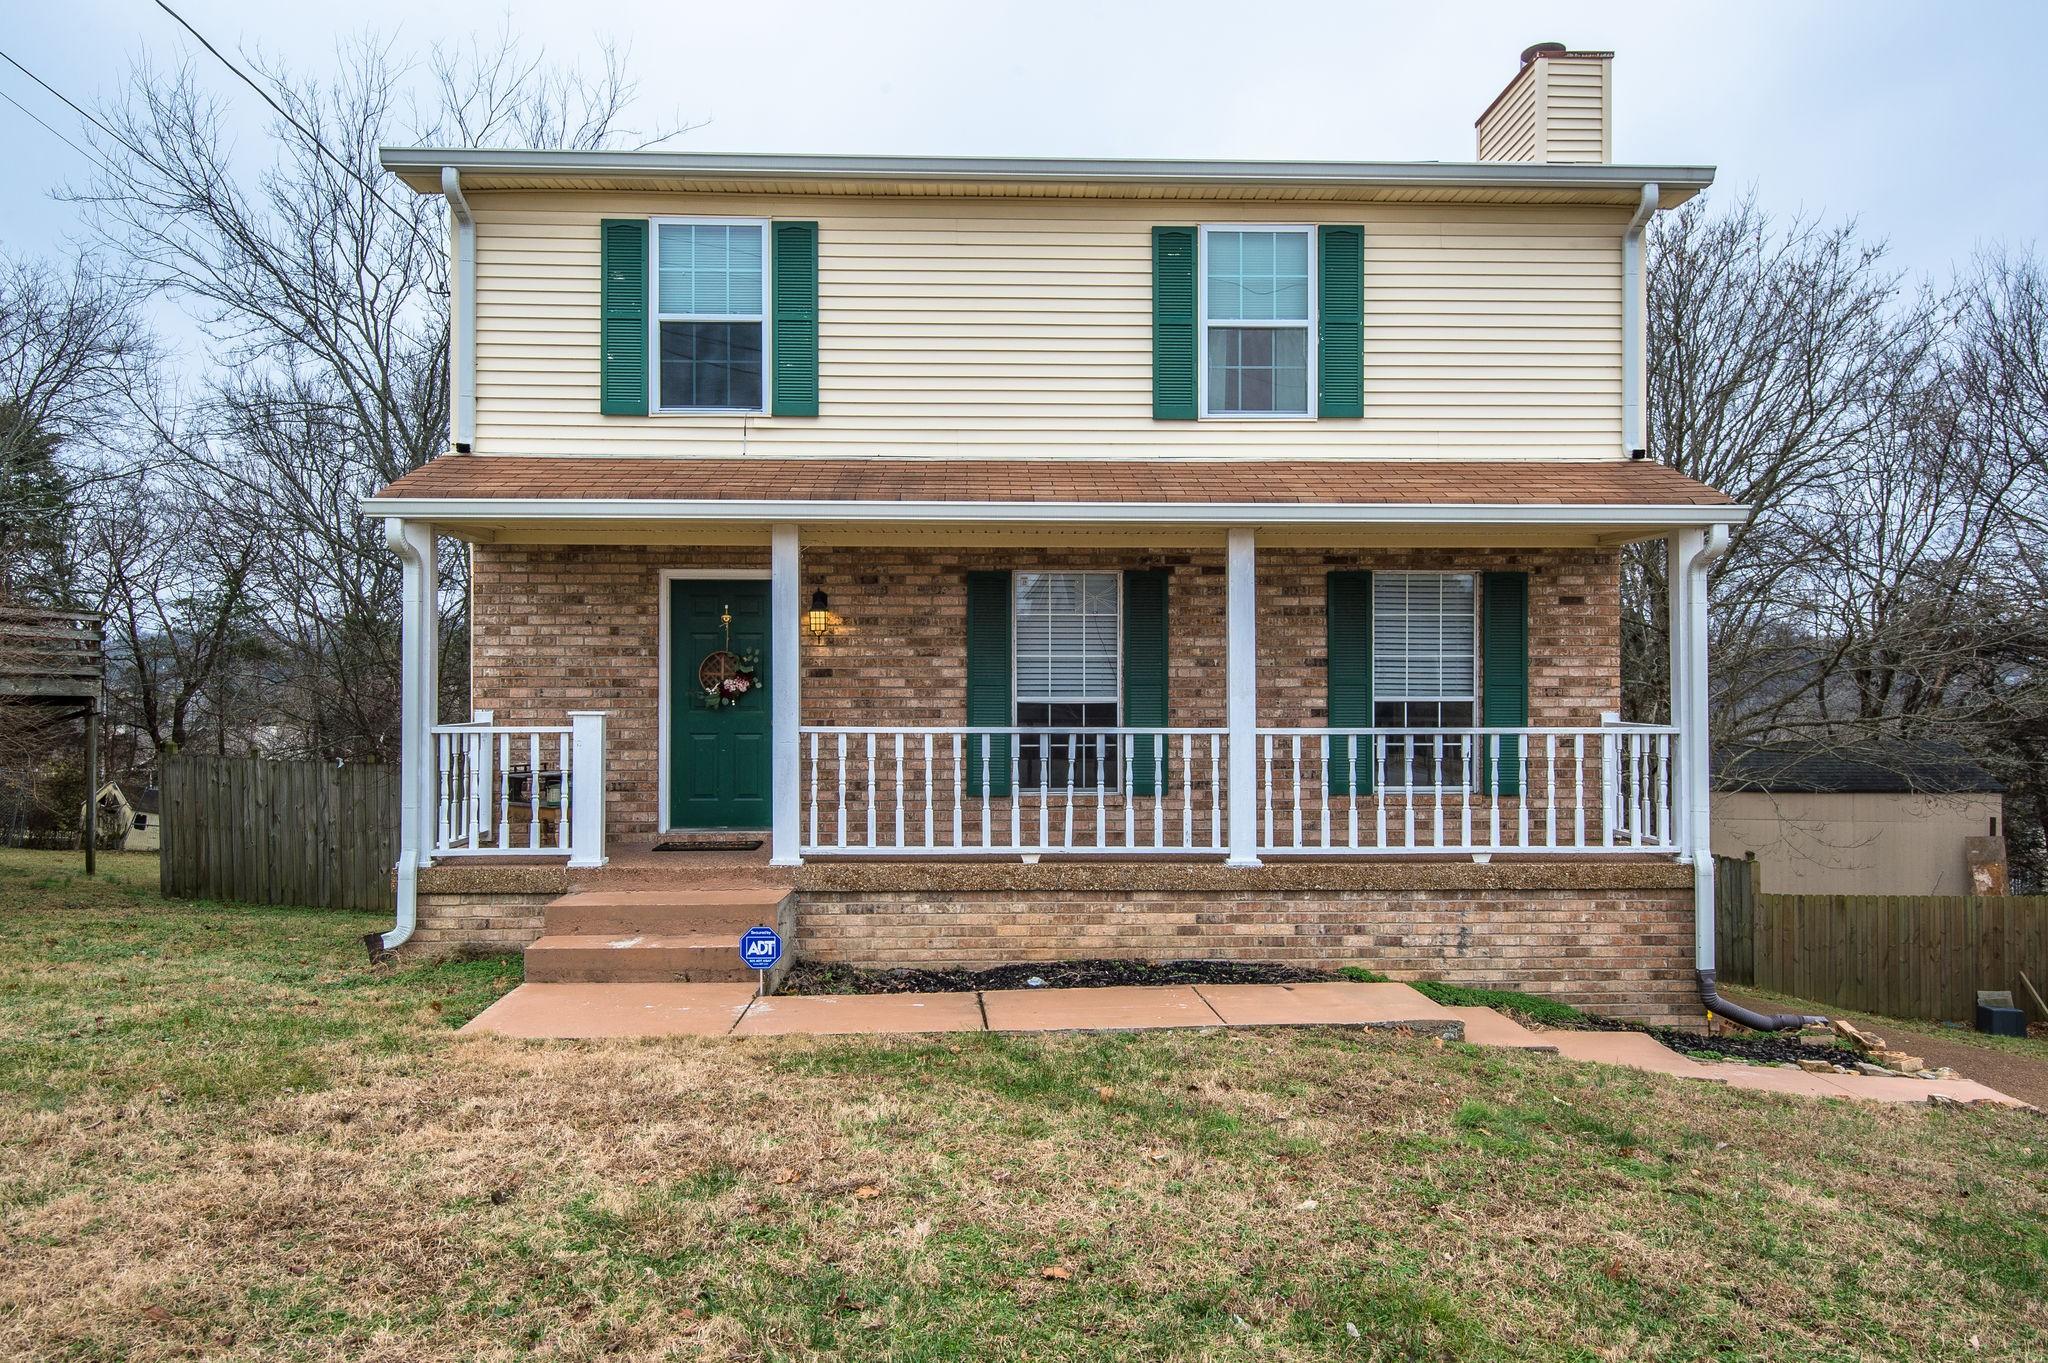 420 Hampstead S, Antioch, TN 37013 - Antioch, TN real estate listing